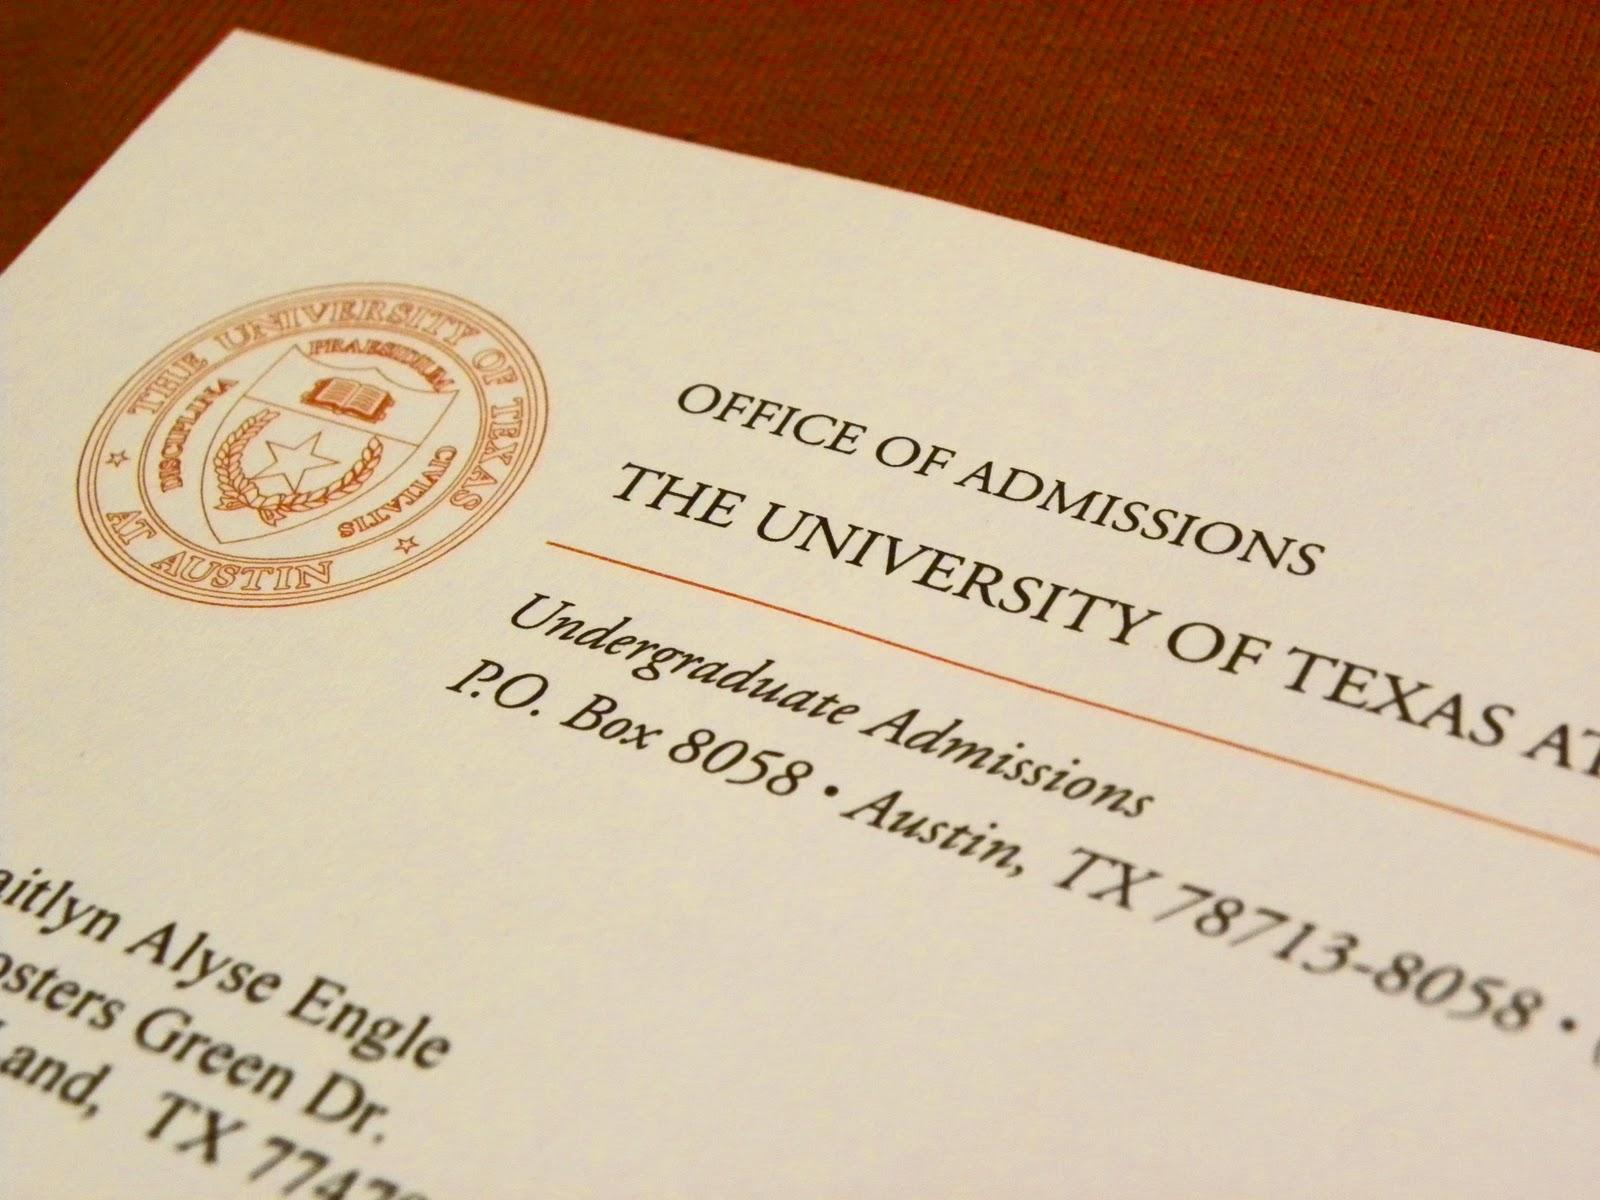 University of texas essays